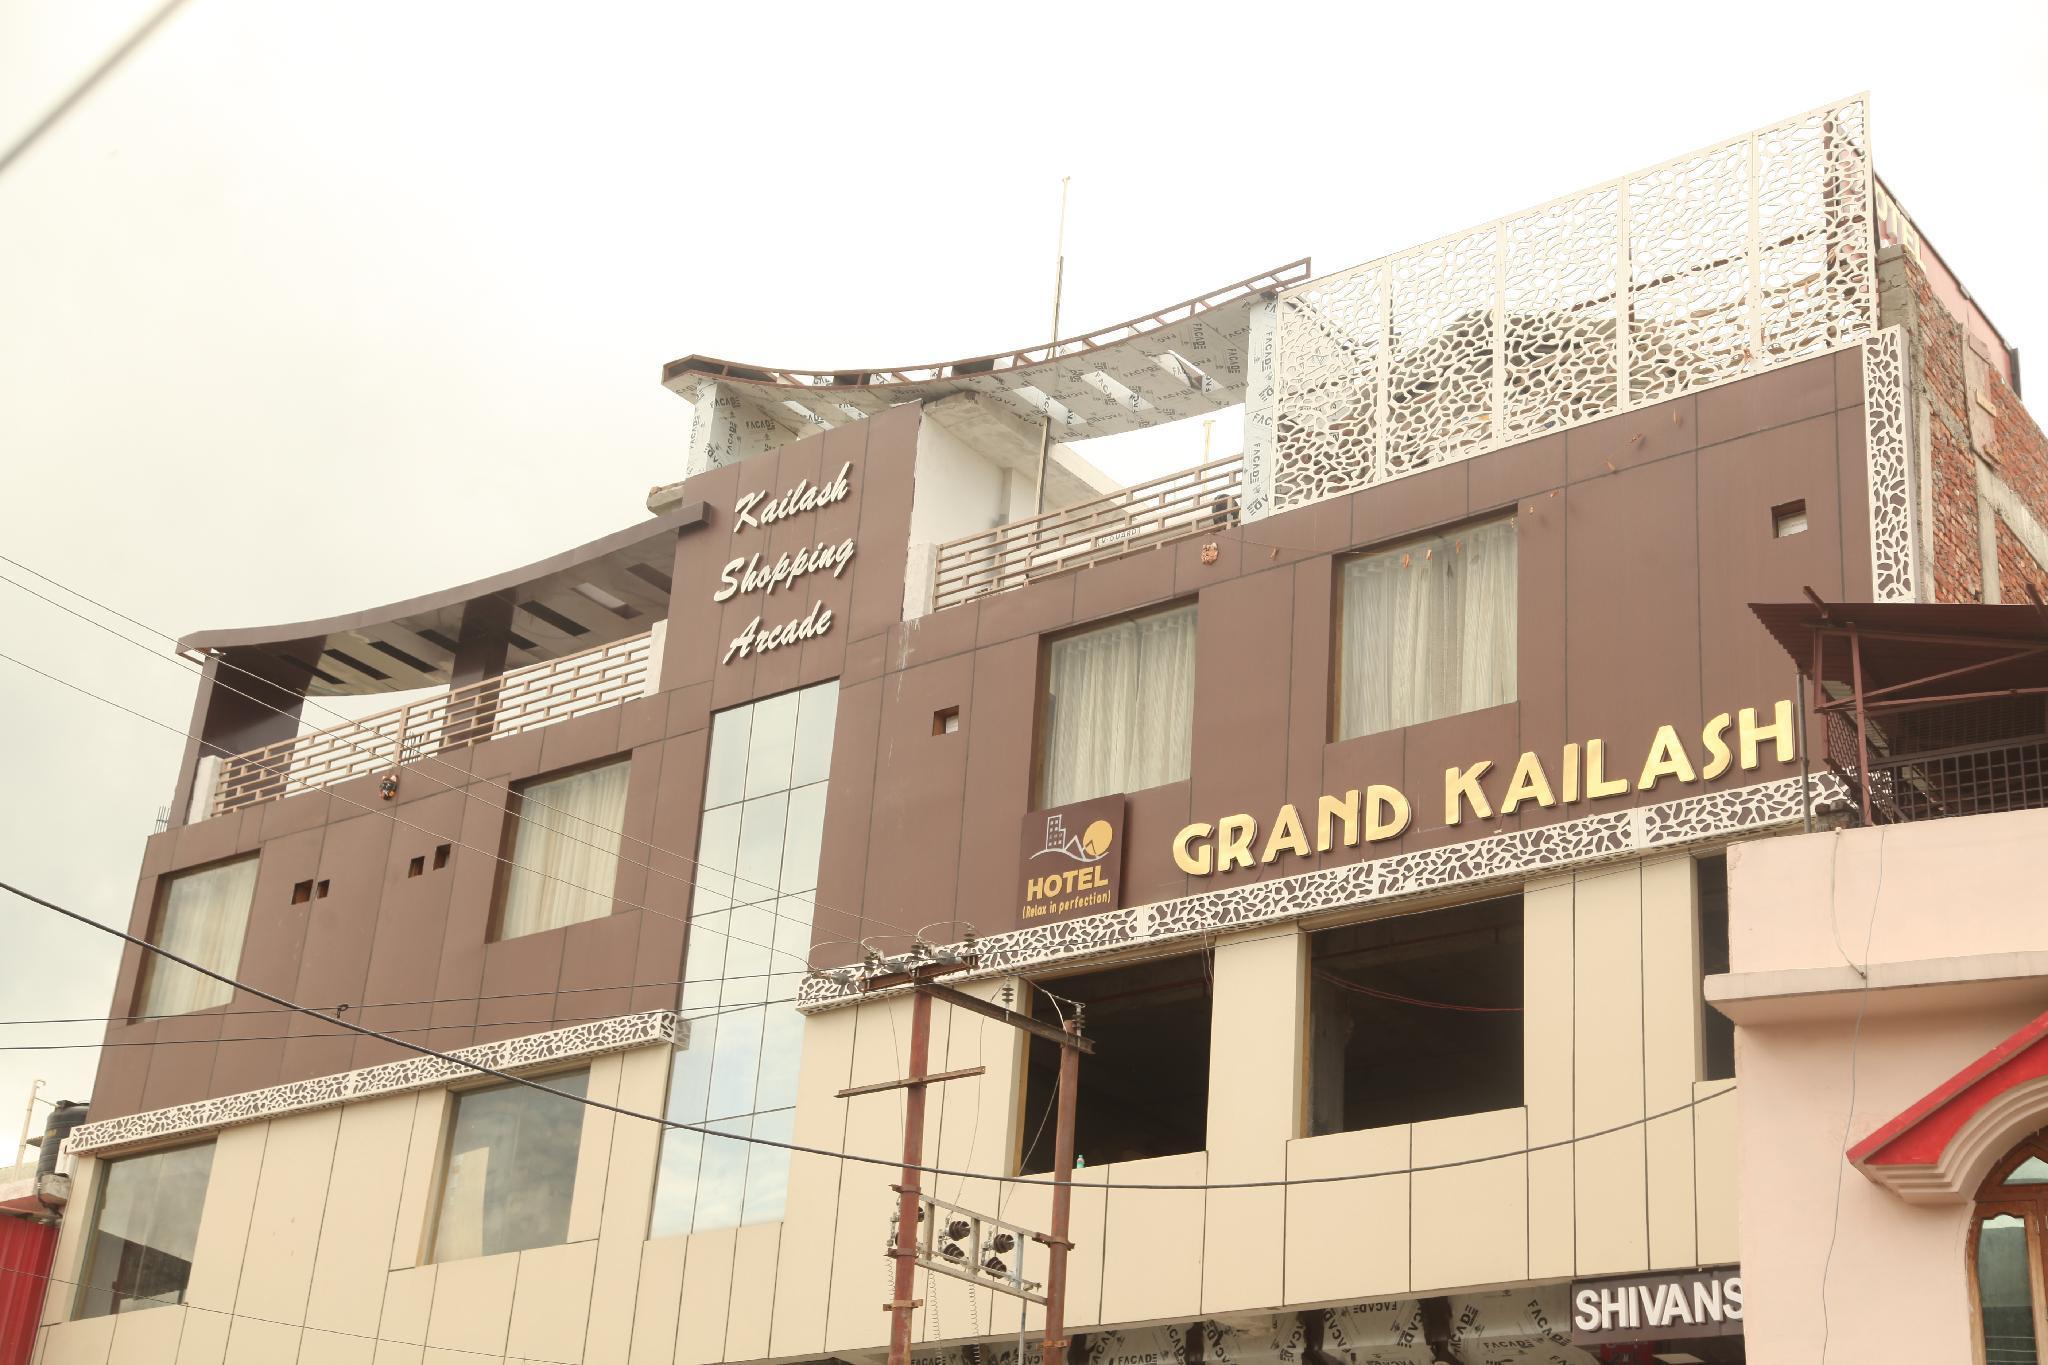 Hotel Grand Kailash